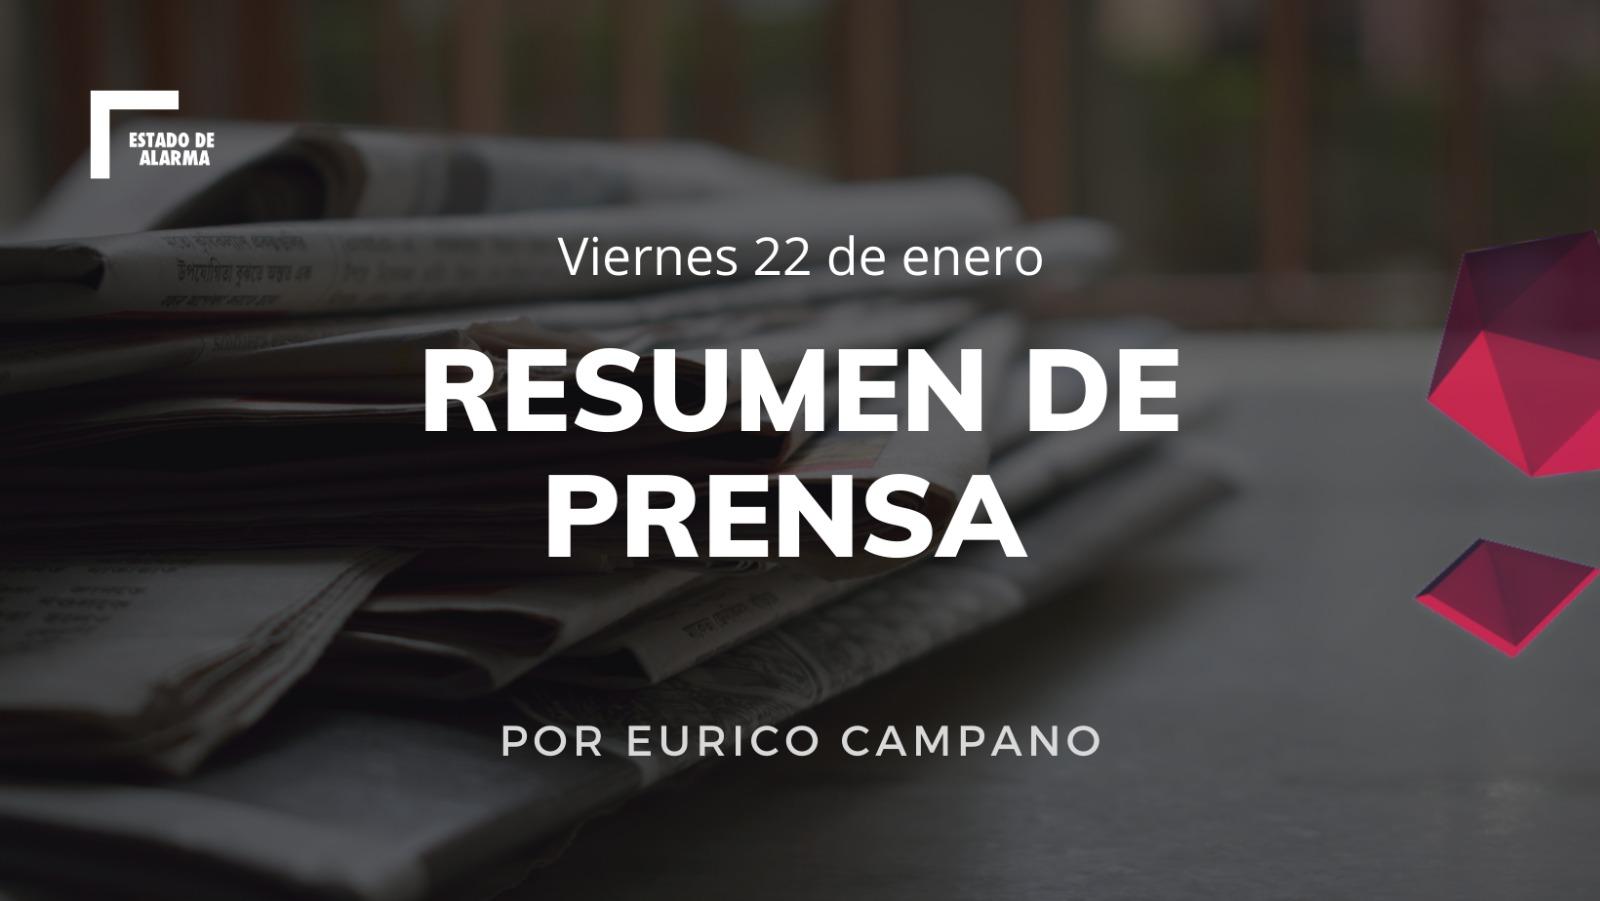 Resumen de prensa 22 de Enero por Eurico Campano